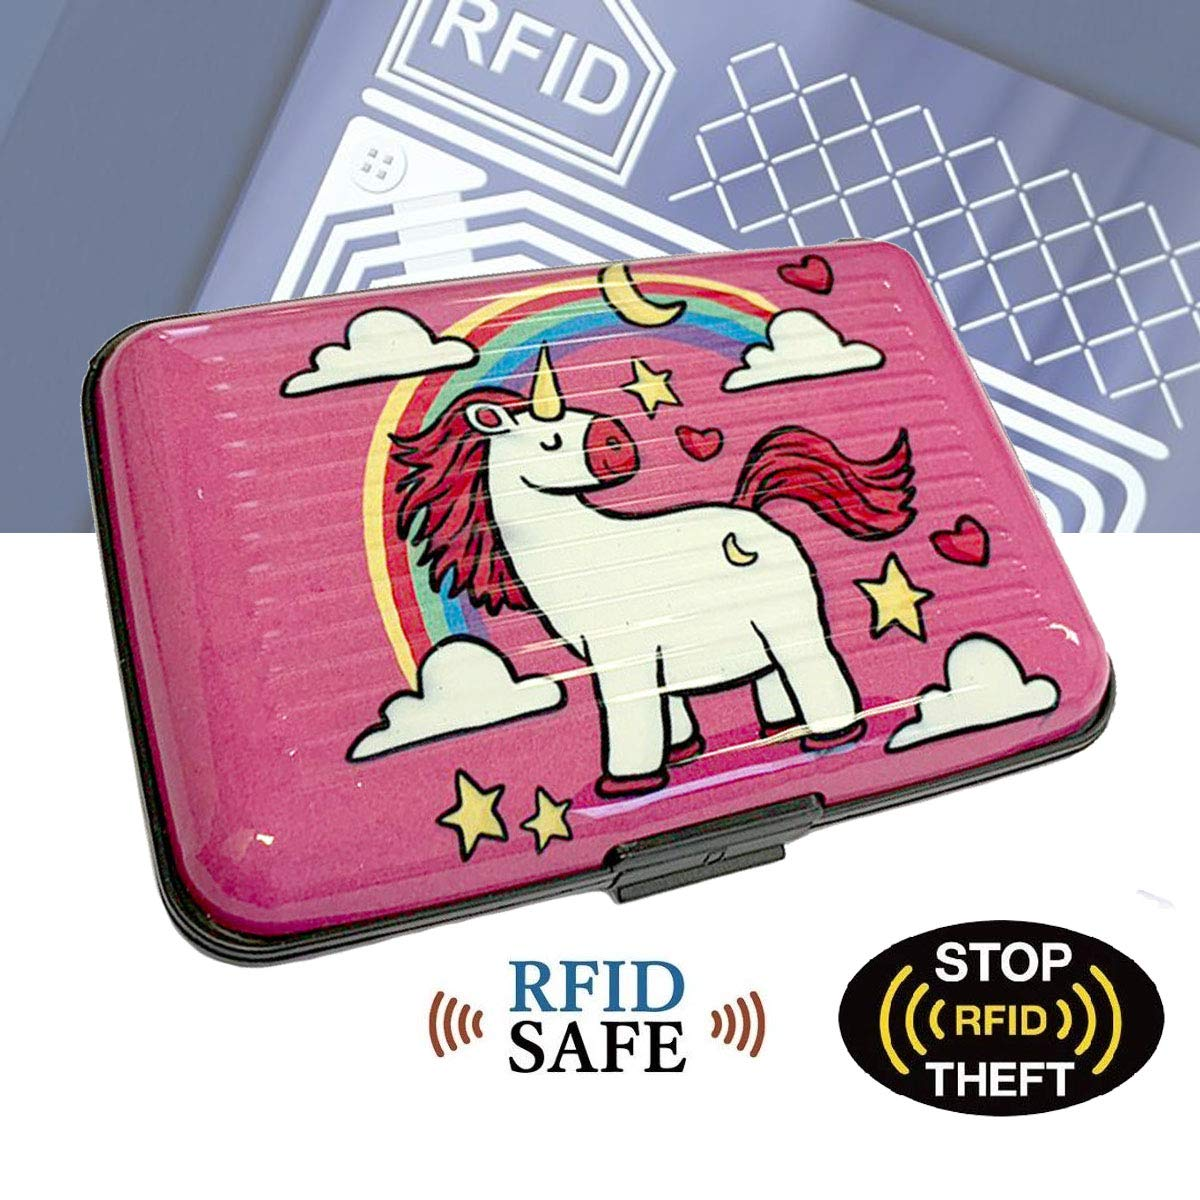 Unicorn Design 01 RFID Blocking Secure Bank Card Holder Lizzy/® Aluminium Credit Card Wallet Holder Unisex